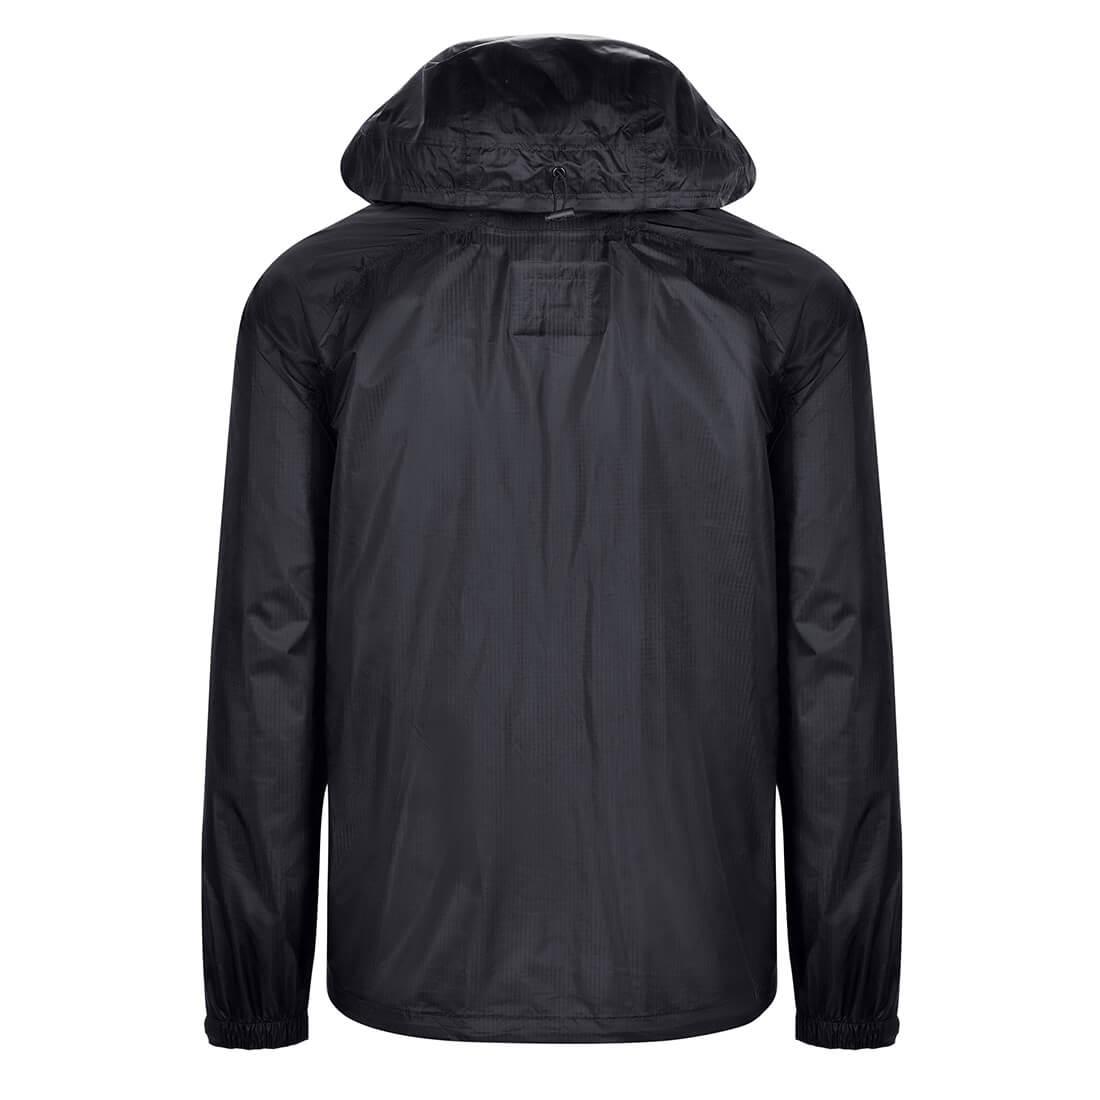 Hydro Packable Rain Jacket 2.0